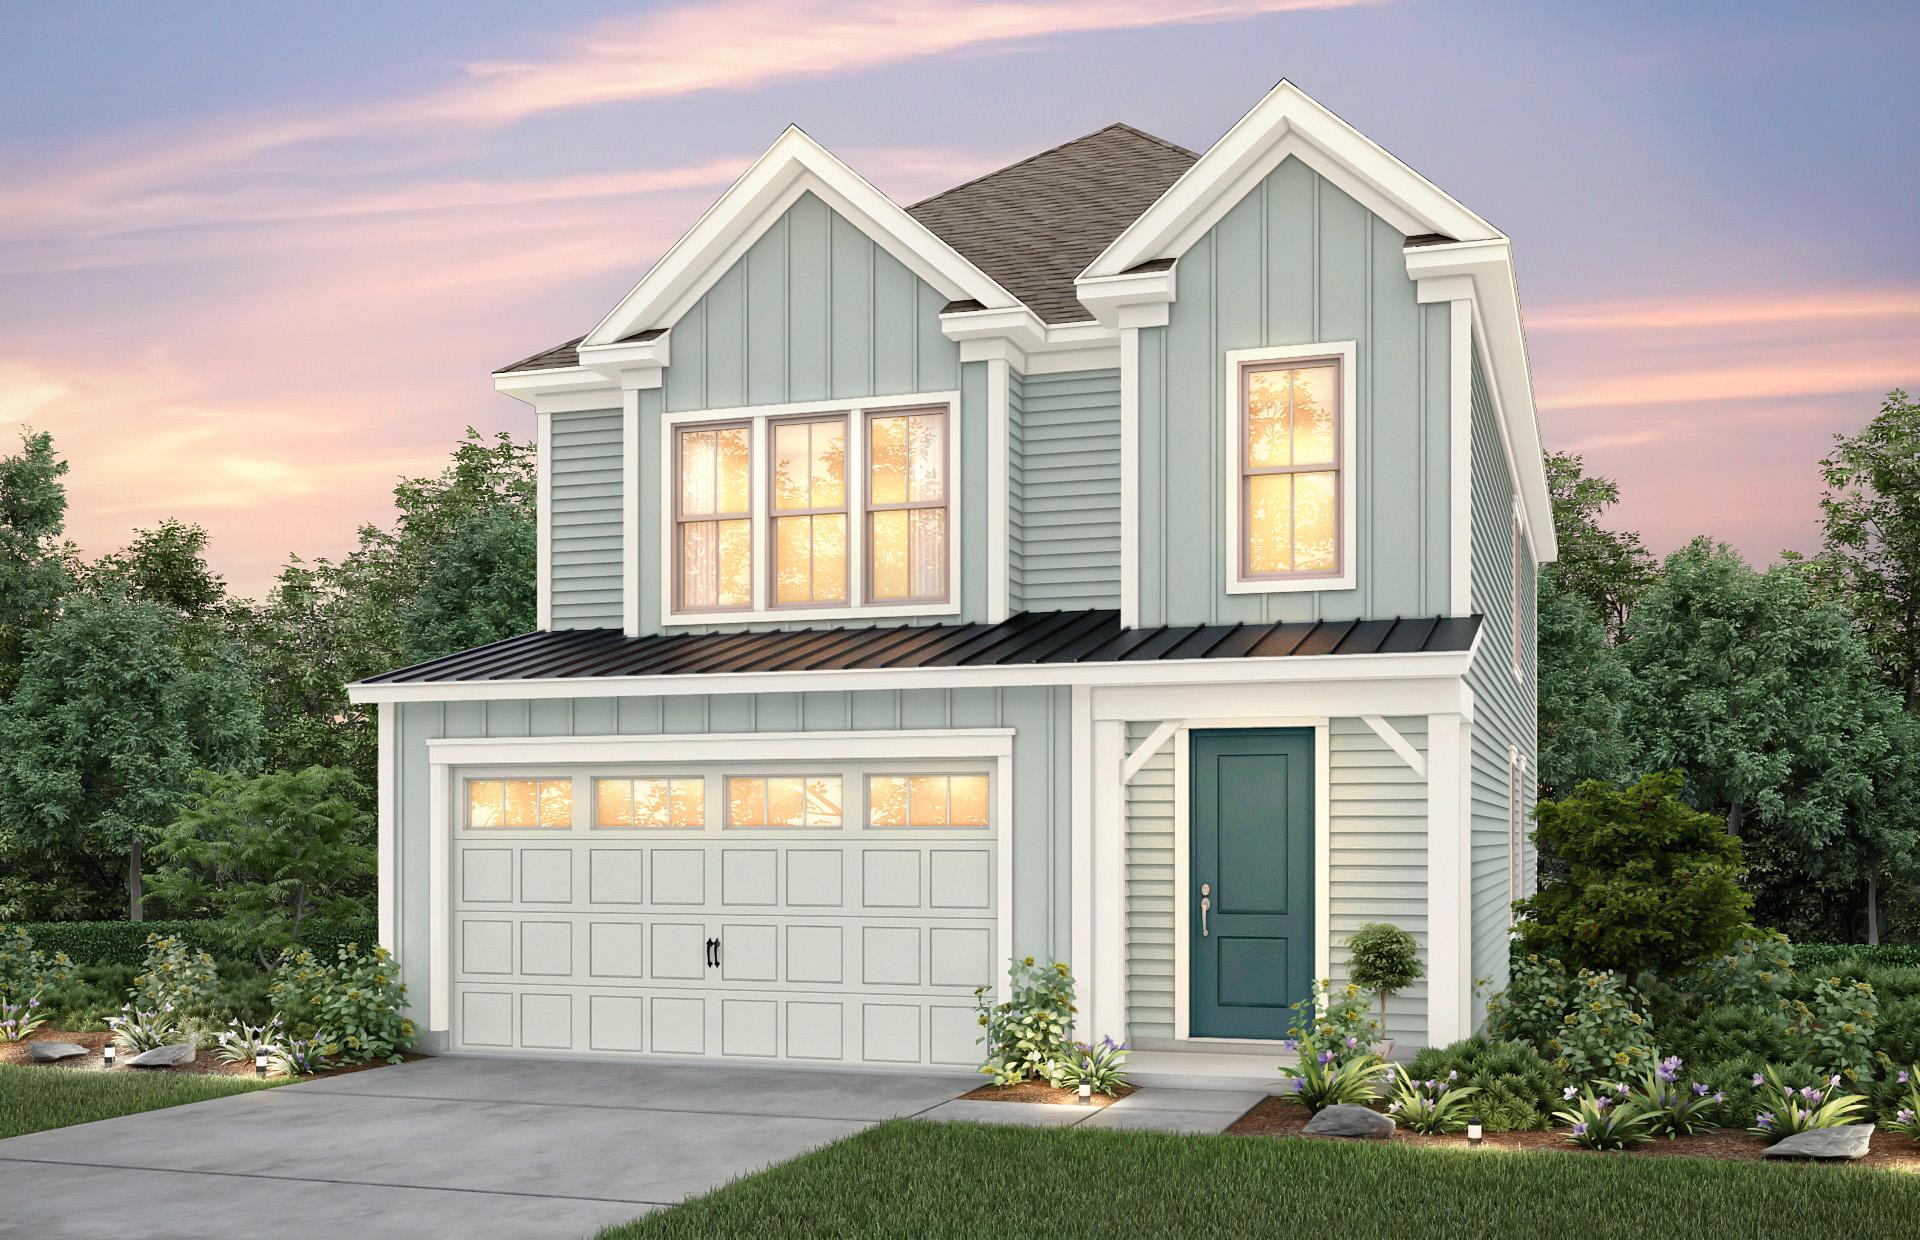 2337 Primus Road, Mount Pleasant, 29466, 4 Bedrooms Bedrooms, ,3 BathroomsBathrooms,For Sale,Primus,21011633